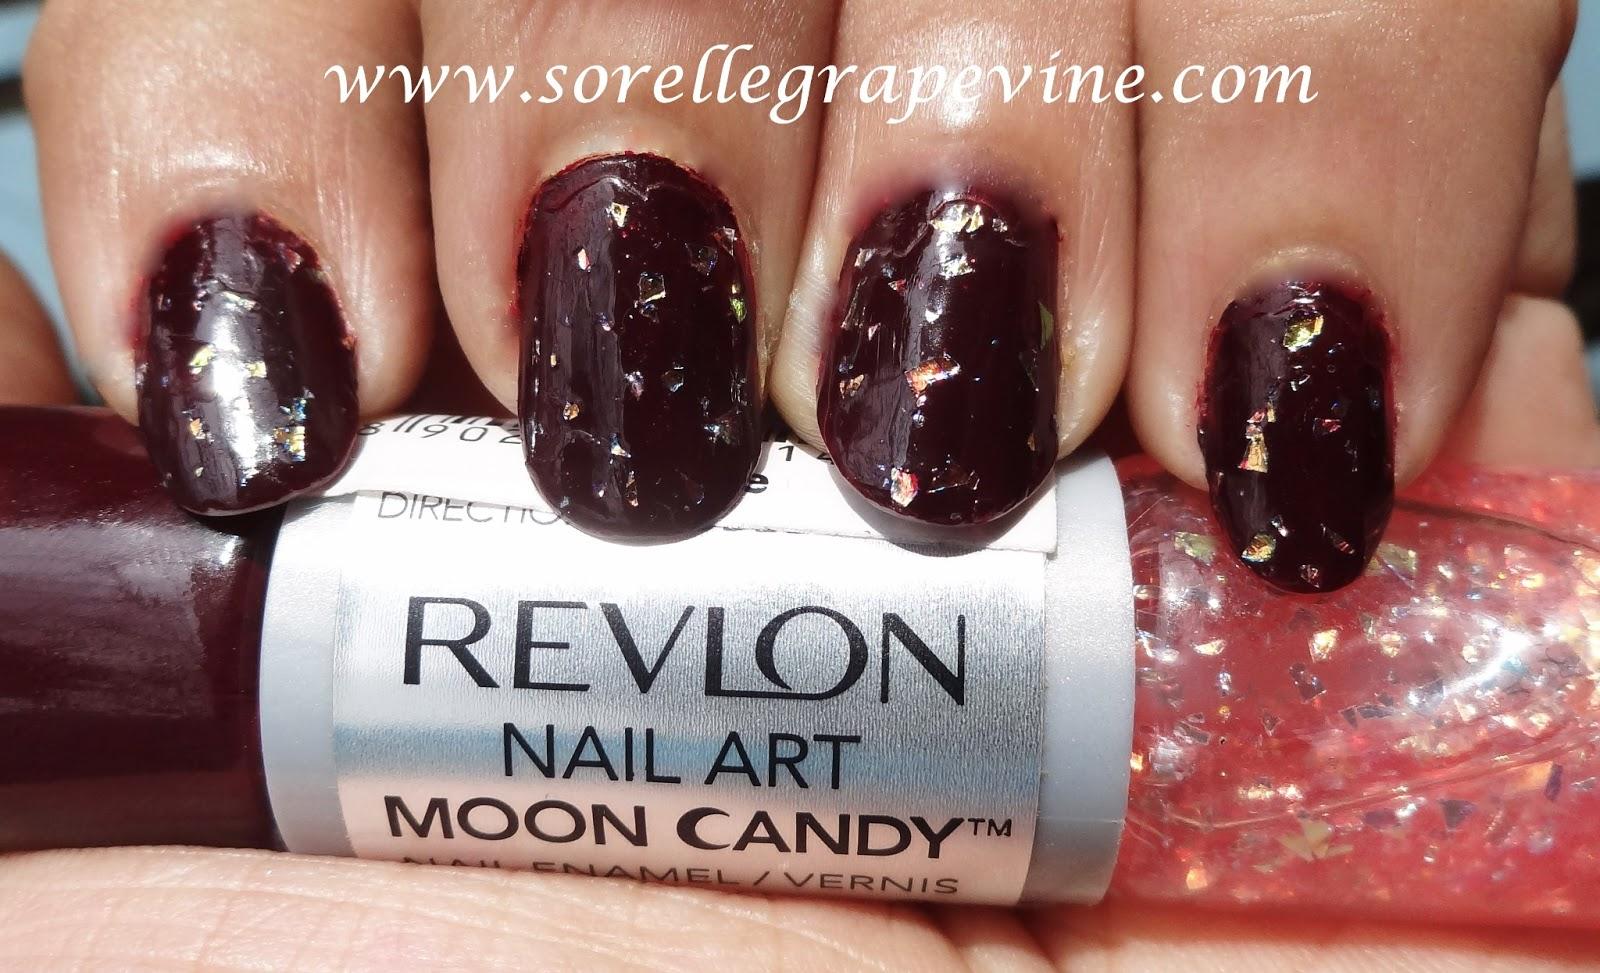 Sorelle GrapevineRevlon Nail Art Moon Candy Satellite 230 - Swatch ...